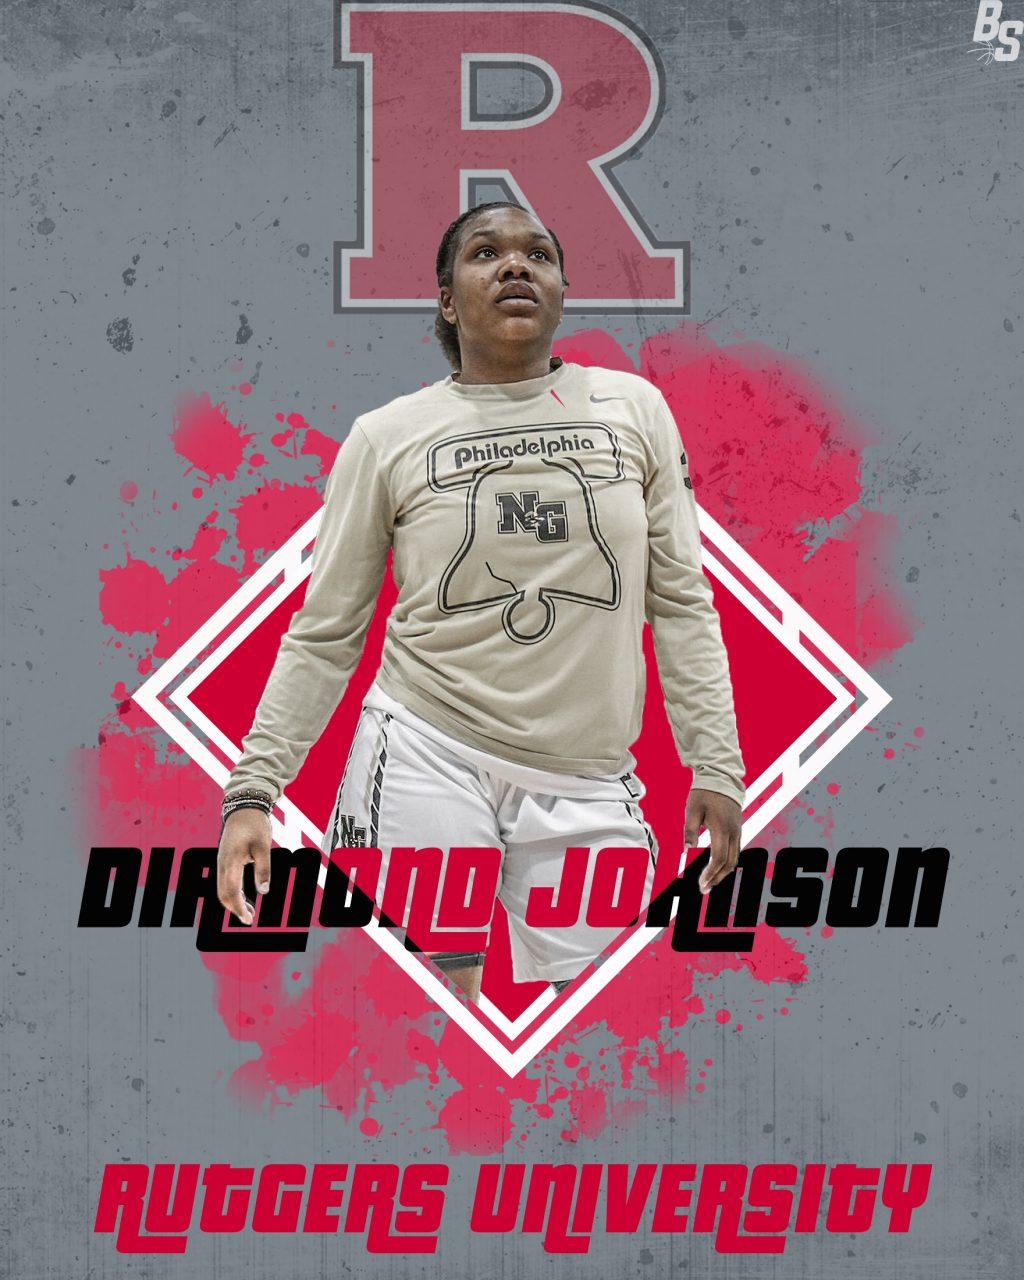 Diamond Johnson, Rutgers